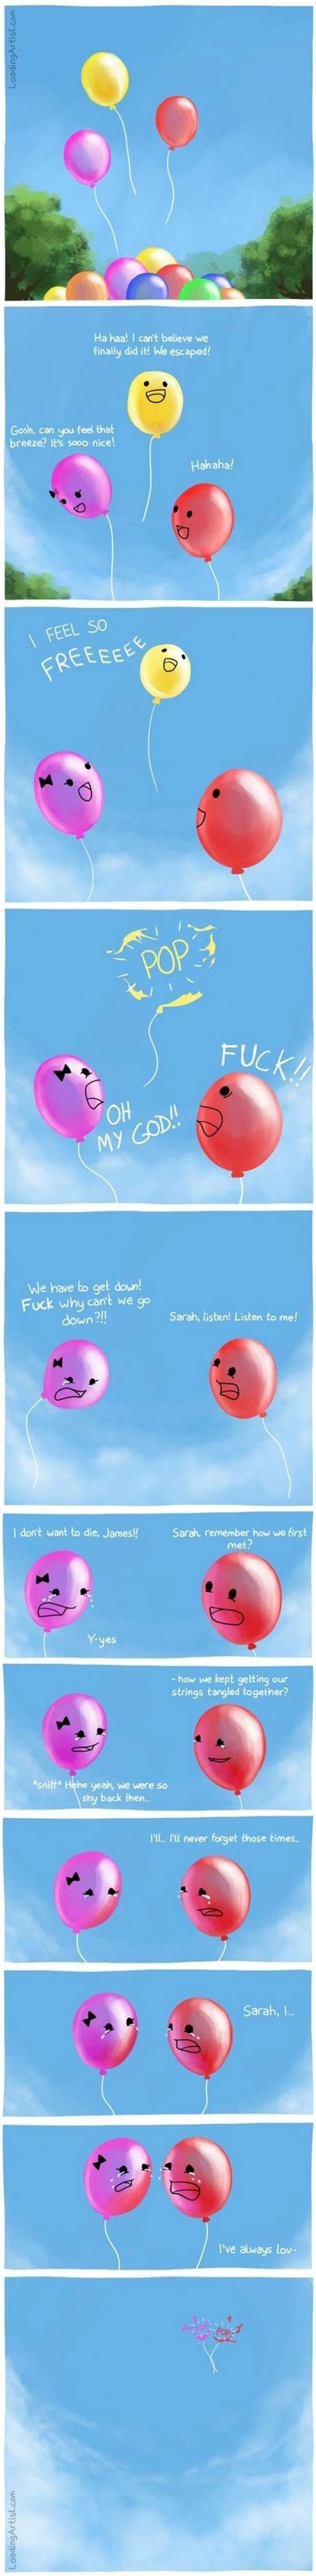 Sad Balloon Story